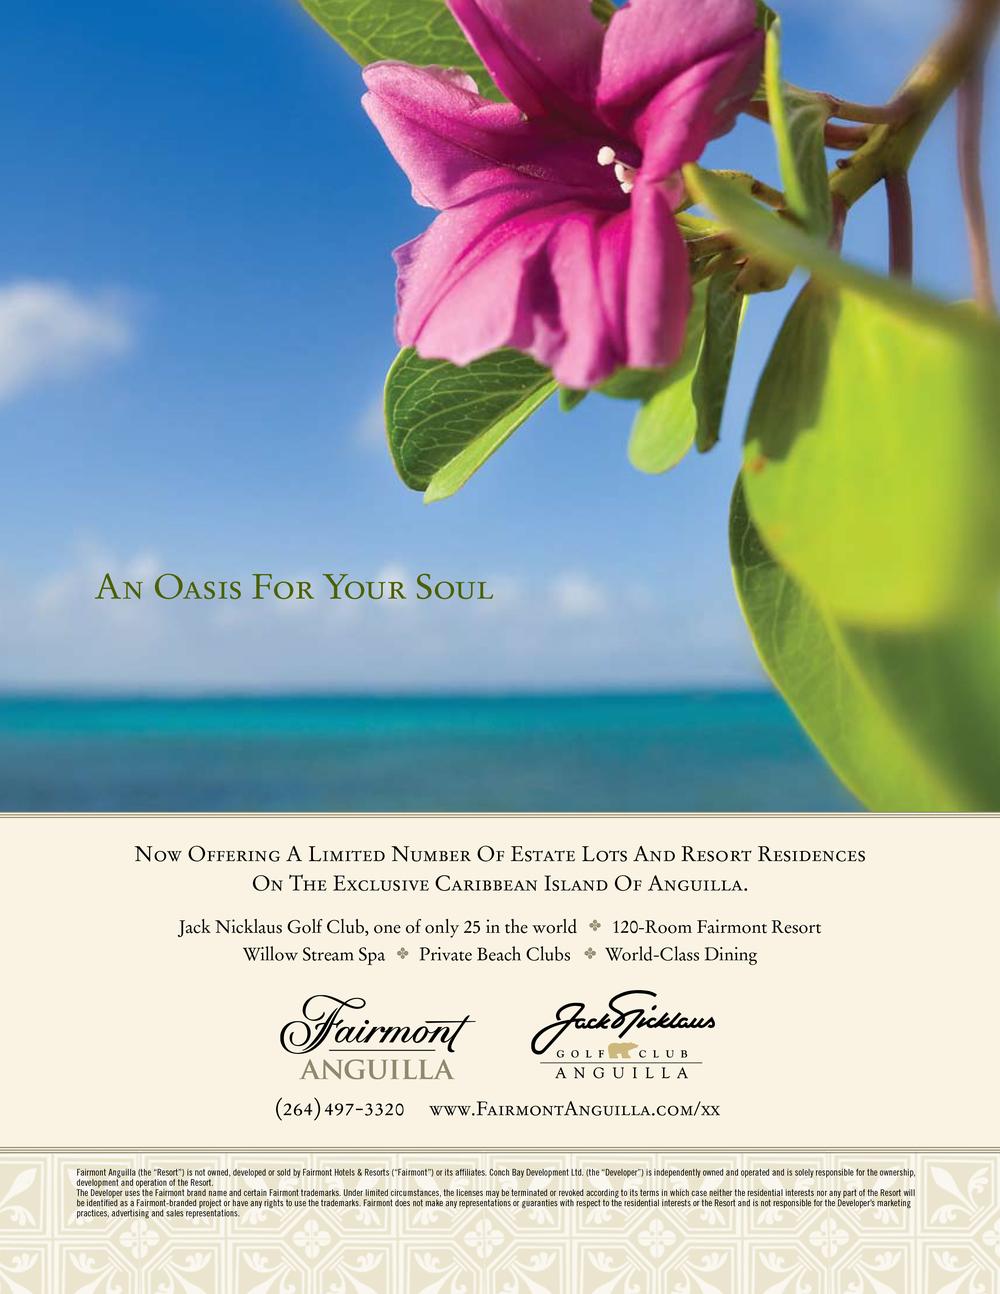 Fairmont Anguilla Magazine Ad - Oasis